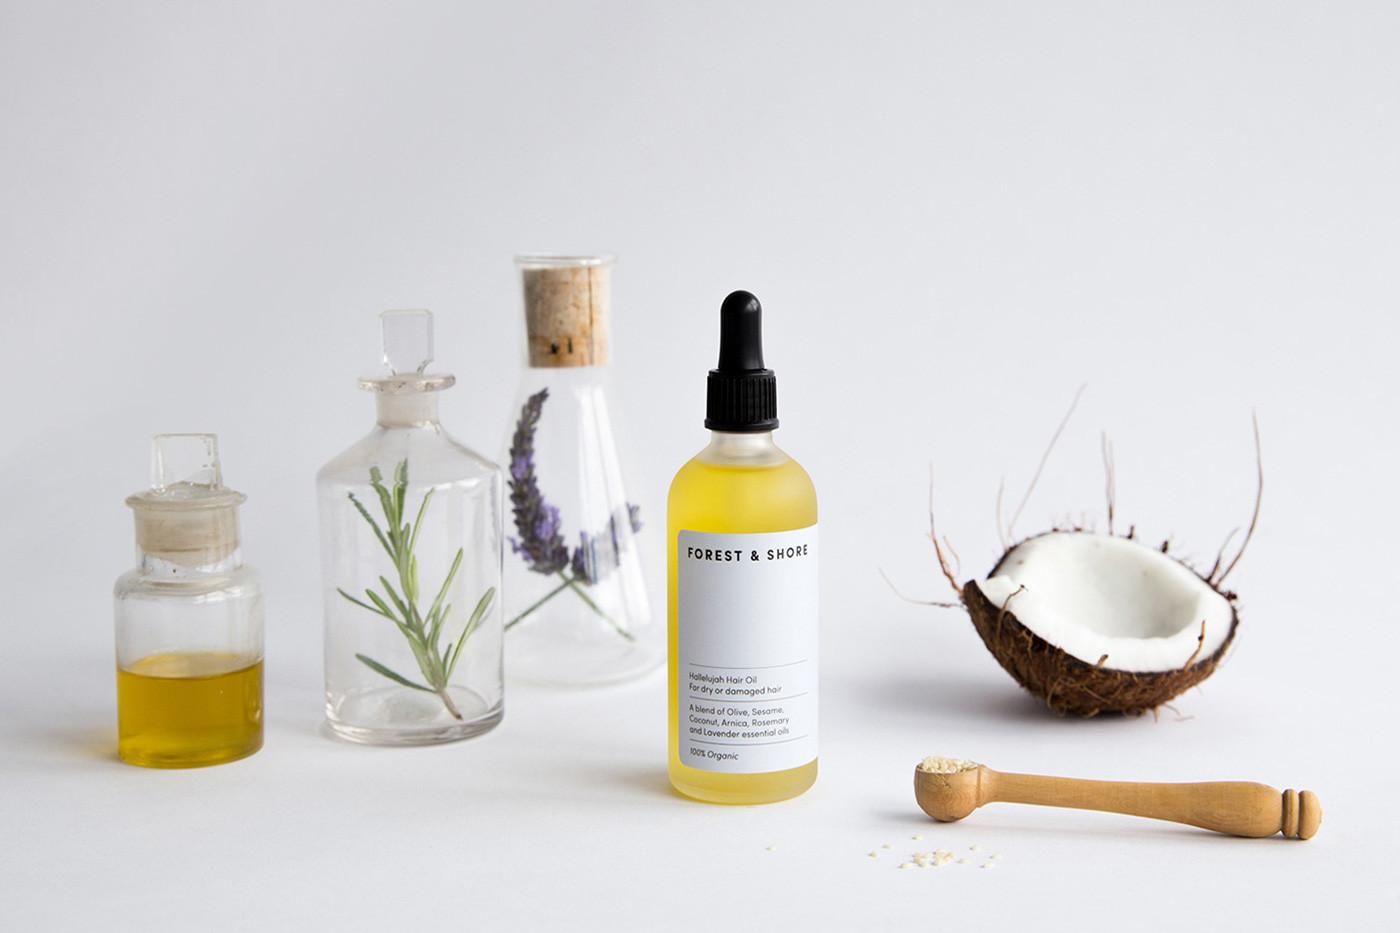 Forest & Shore产品包装设计分享 欣赏-第6张